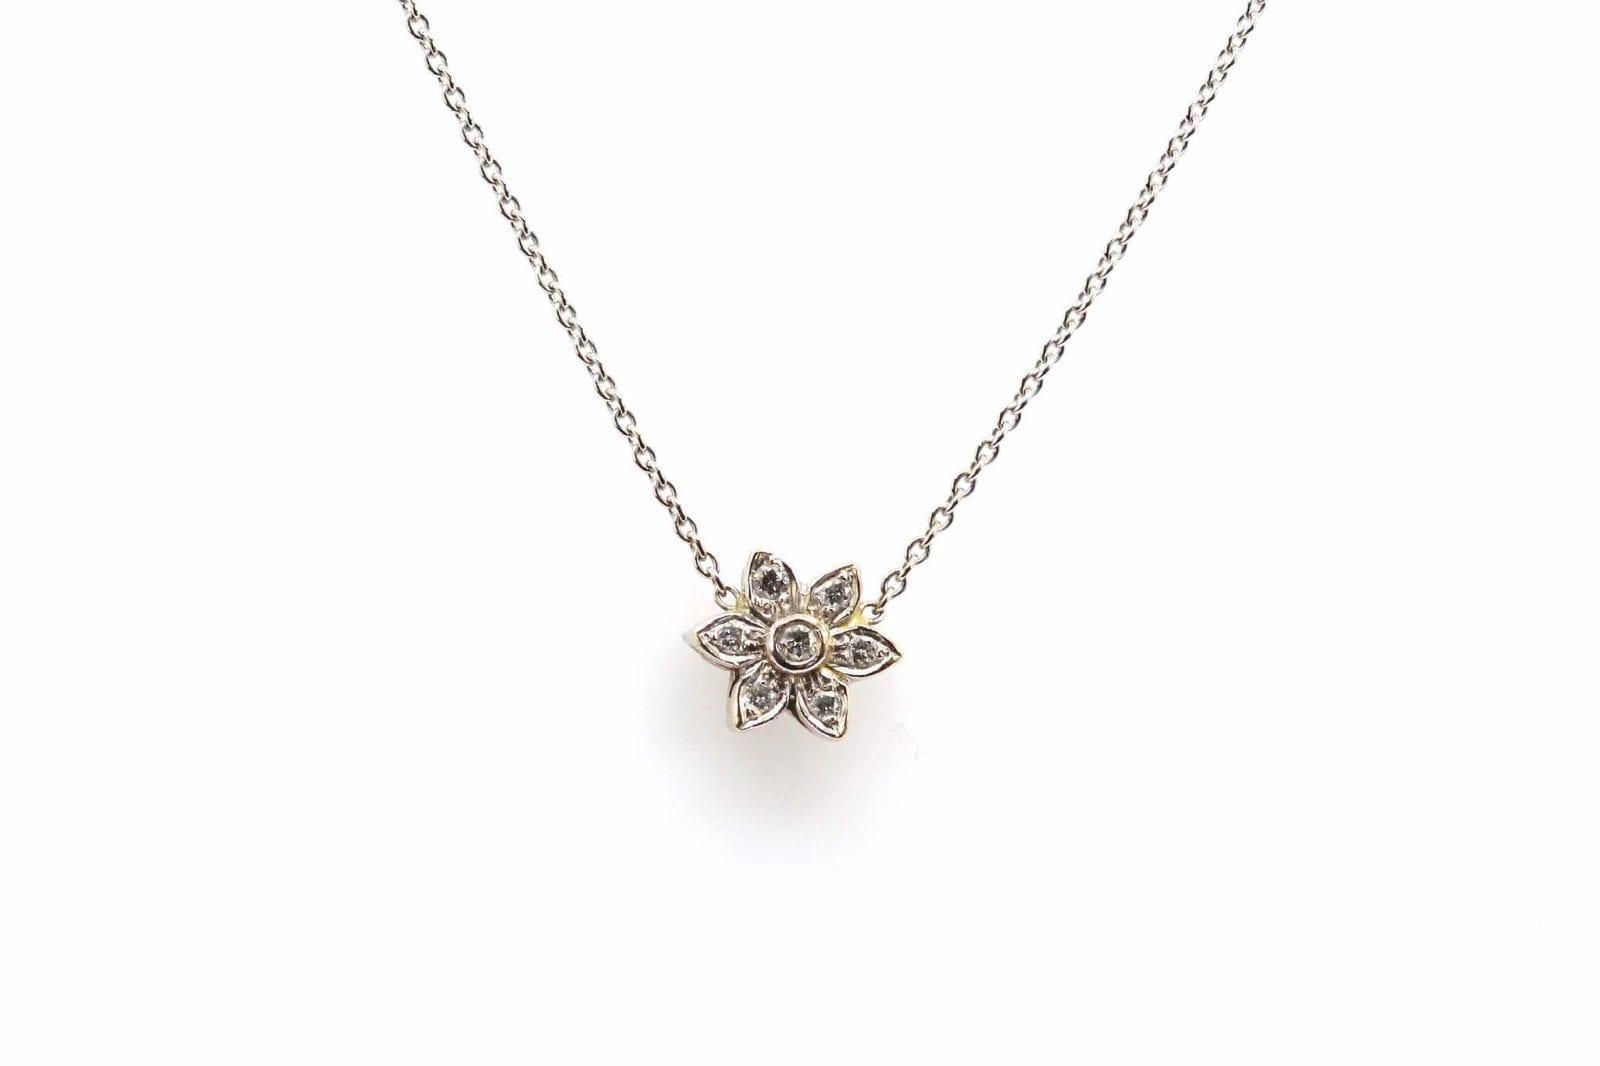 pendentif fleur diamants or blanc 18k